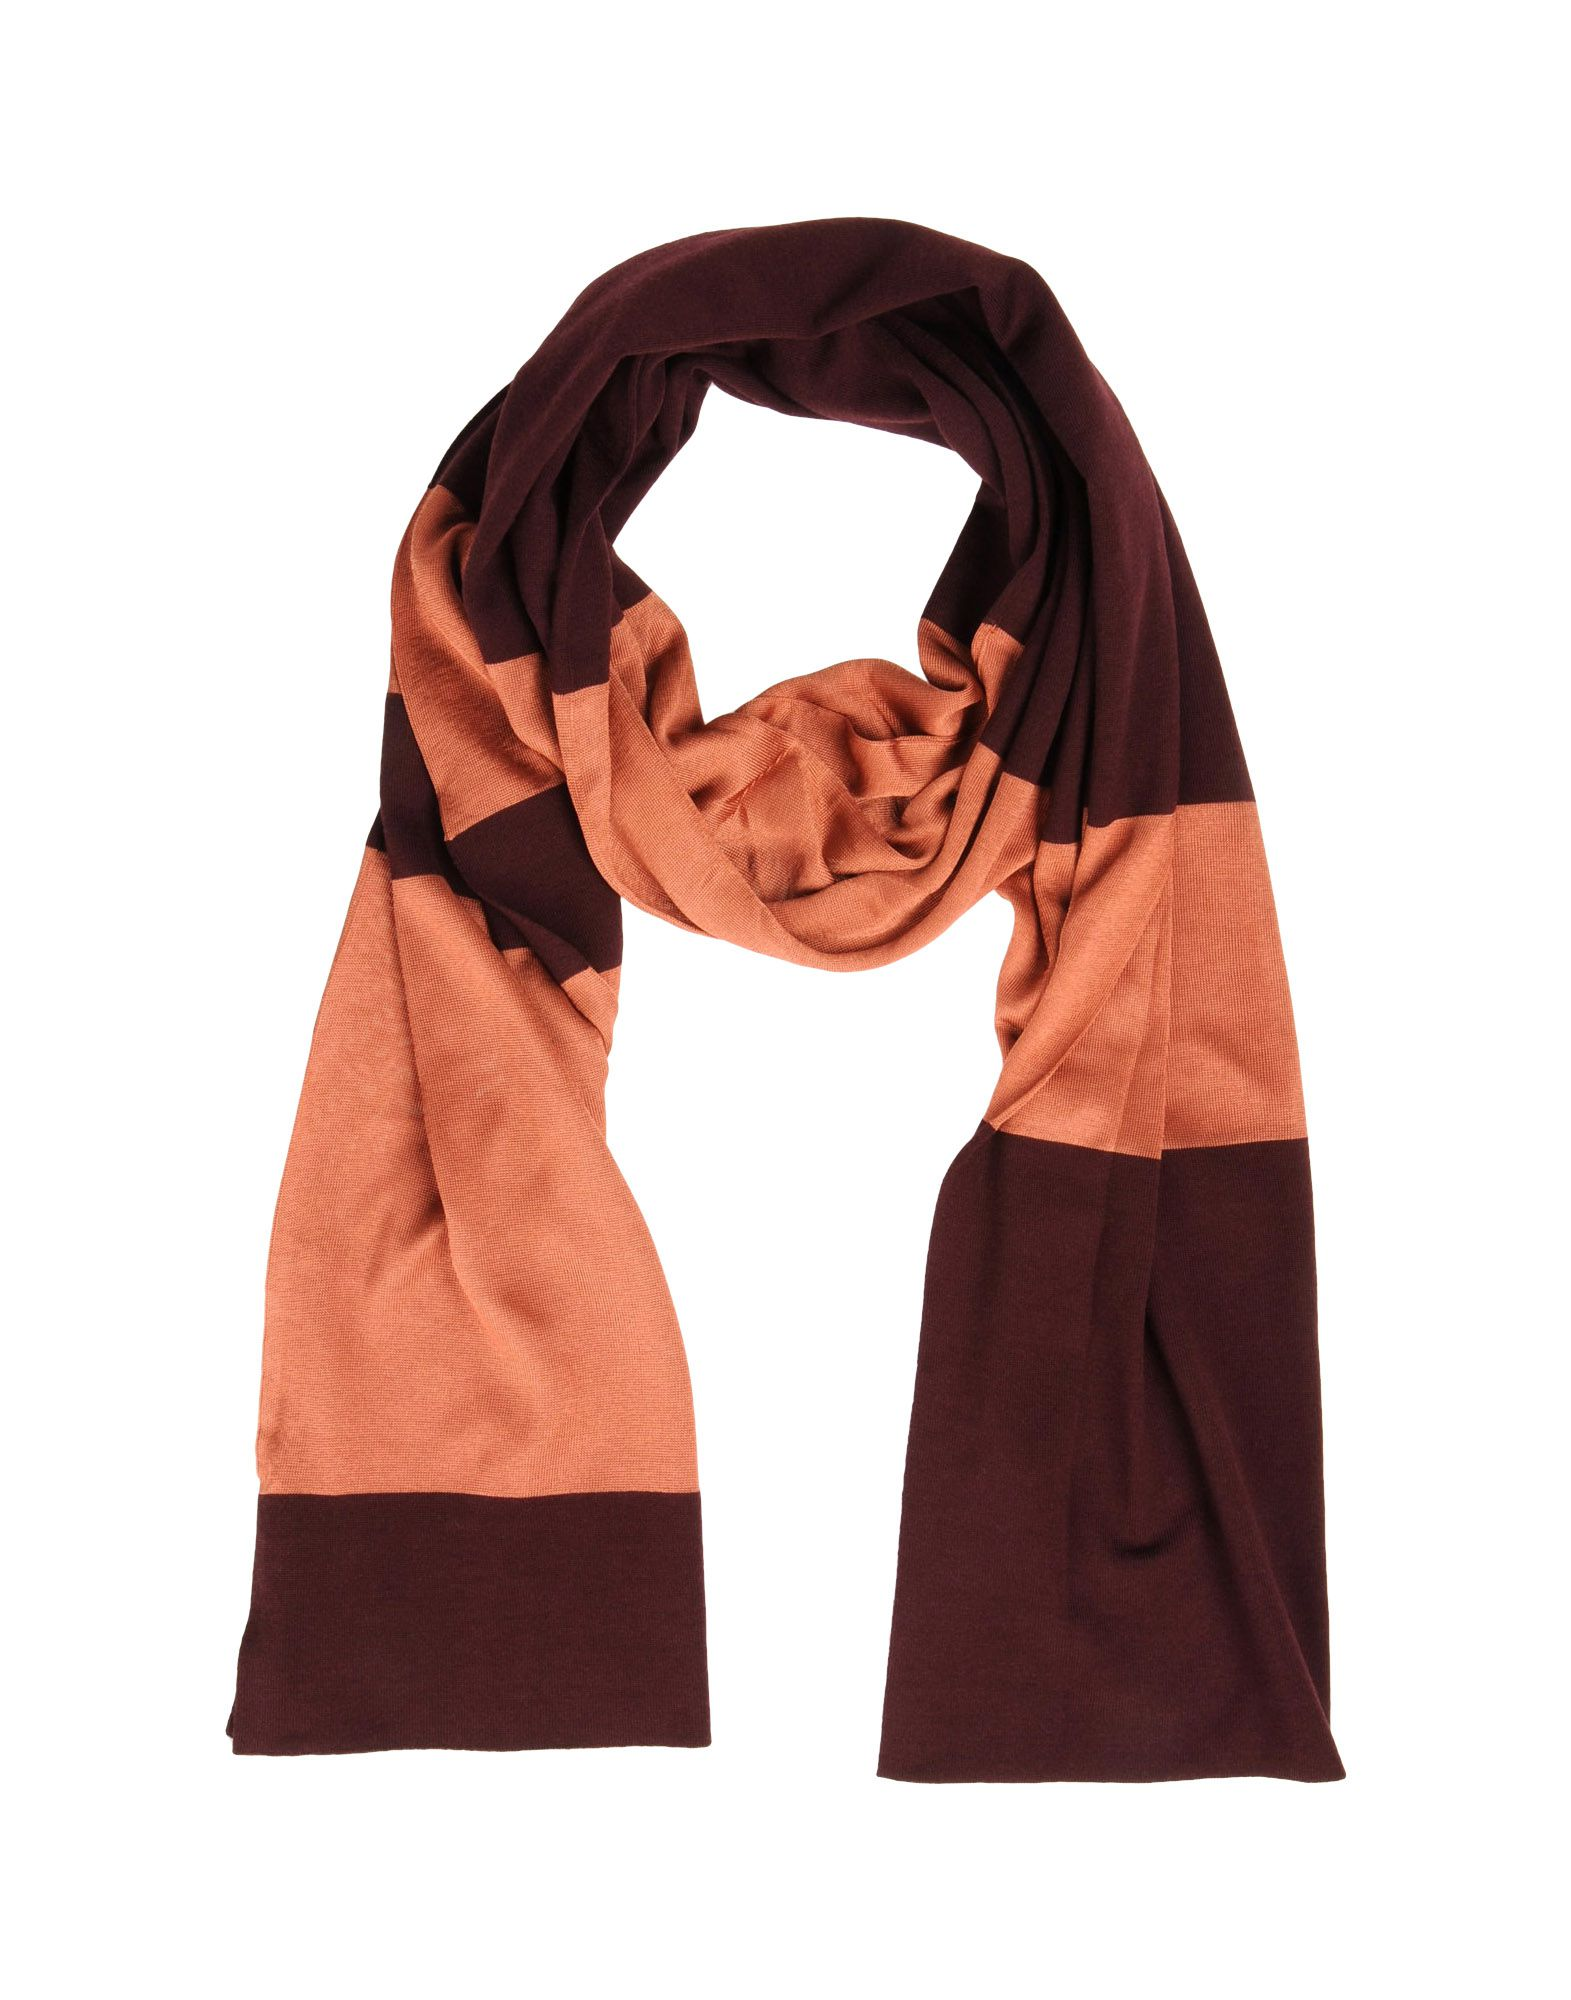 pringle of scotland oblong scarf in purple purple